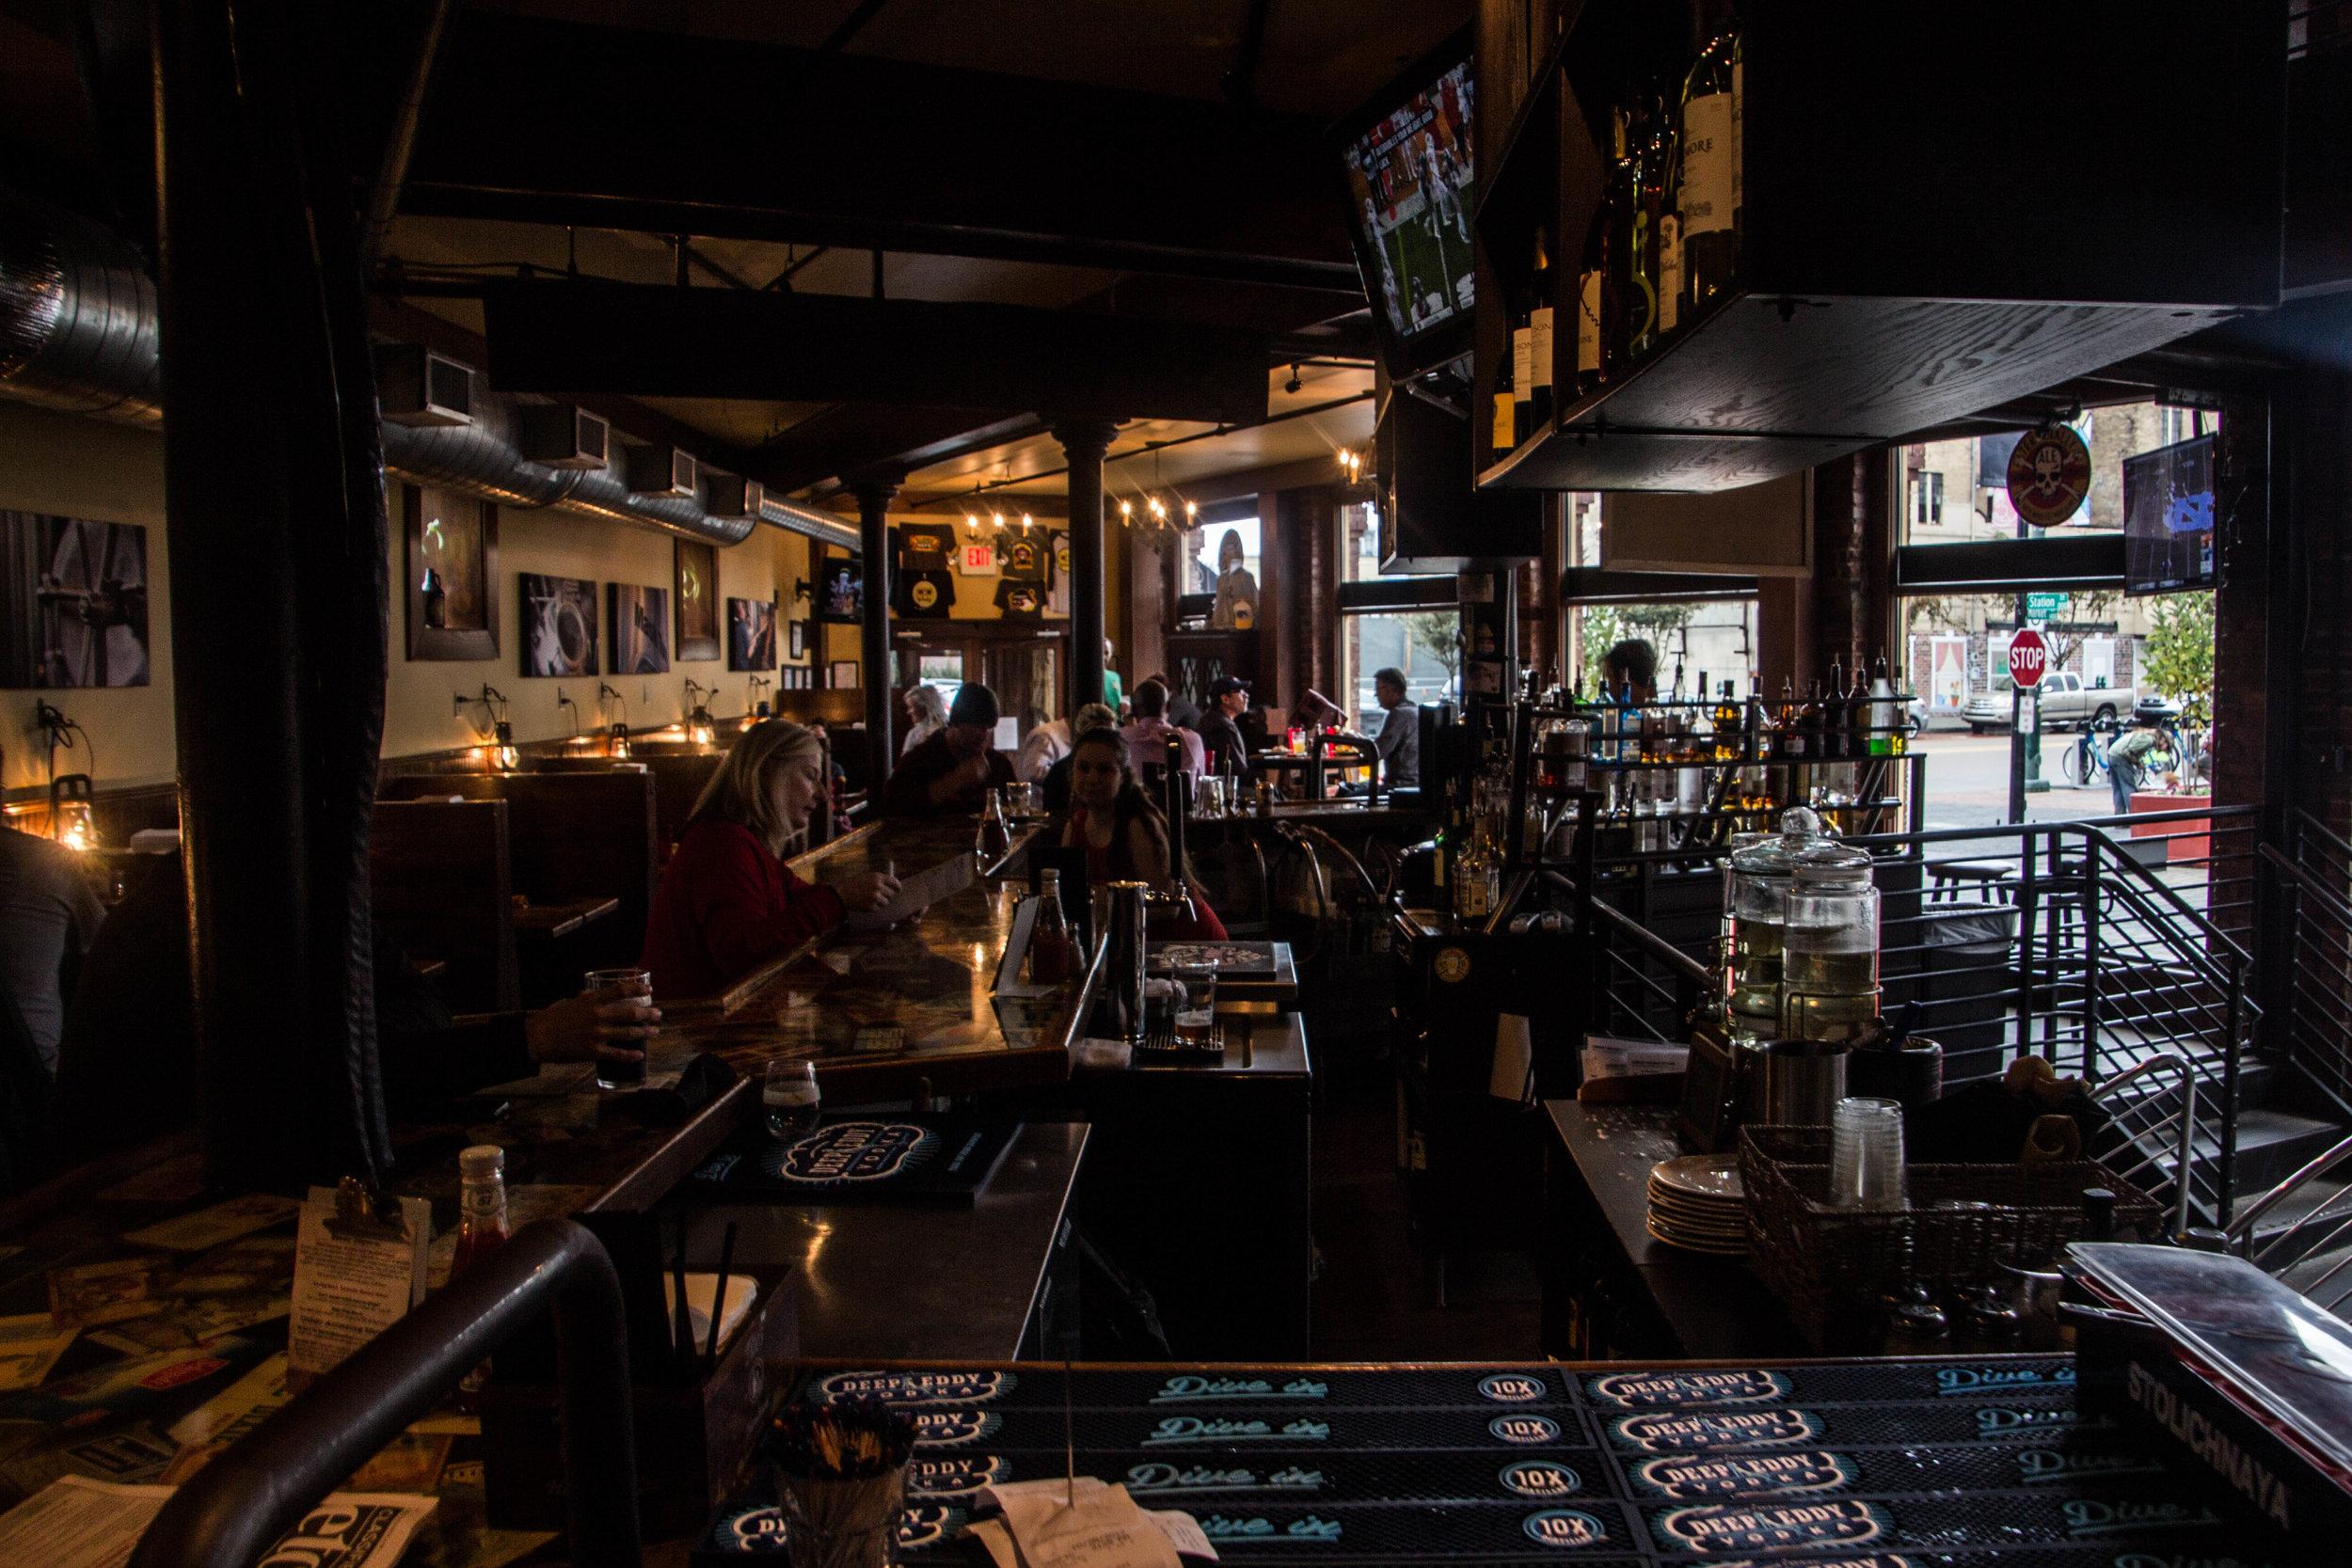 terminal-chattanooga-bars-restaurants-2.jpg